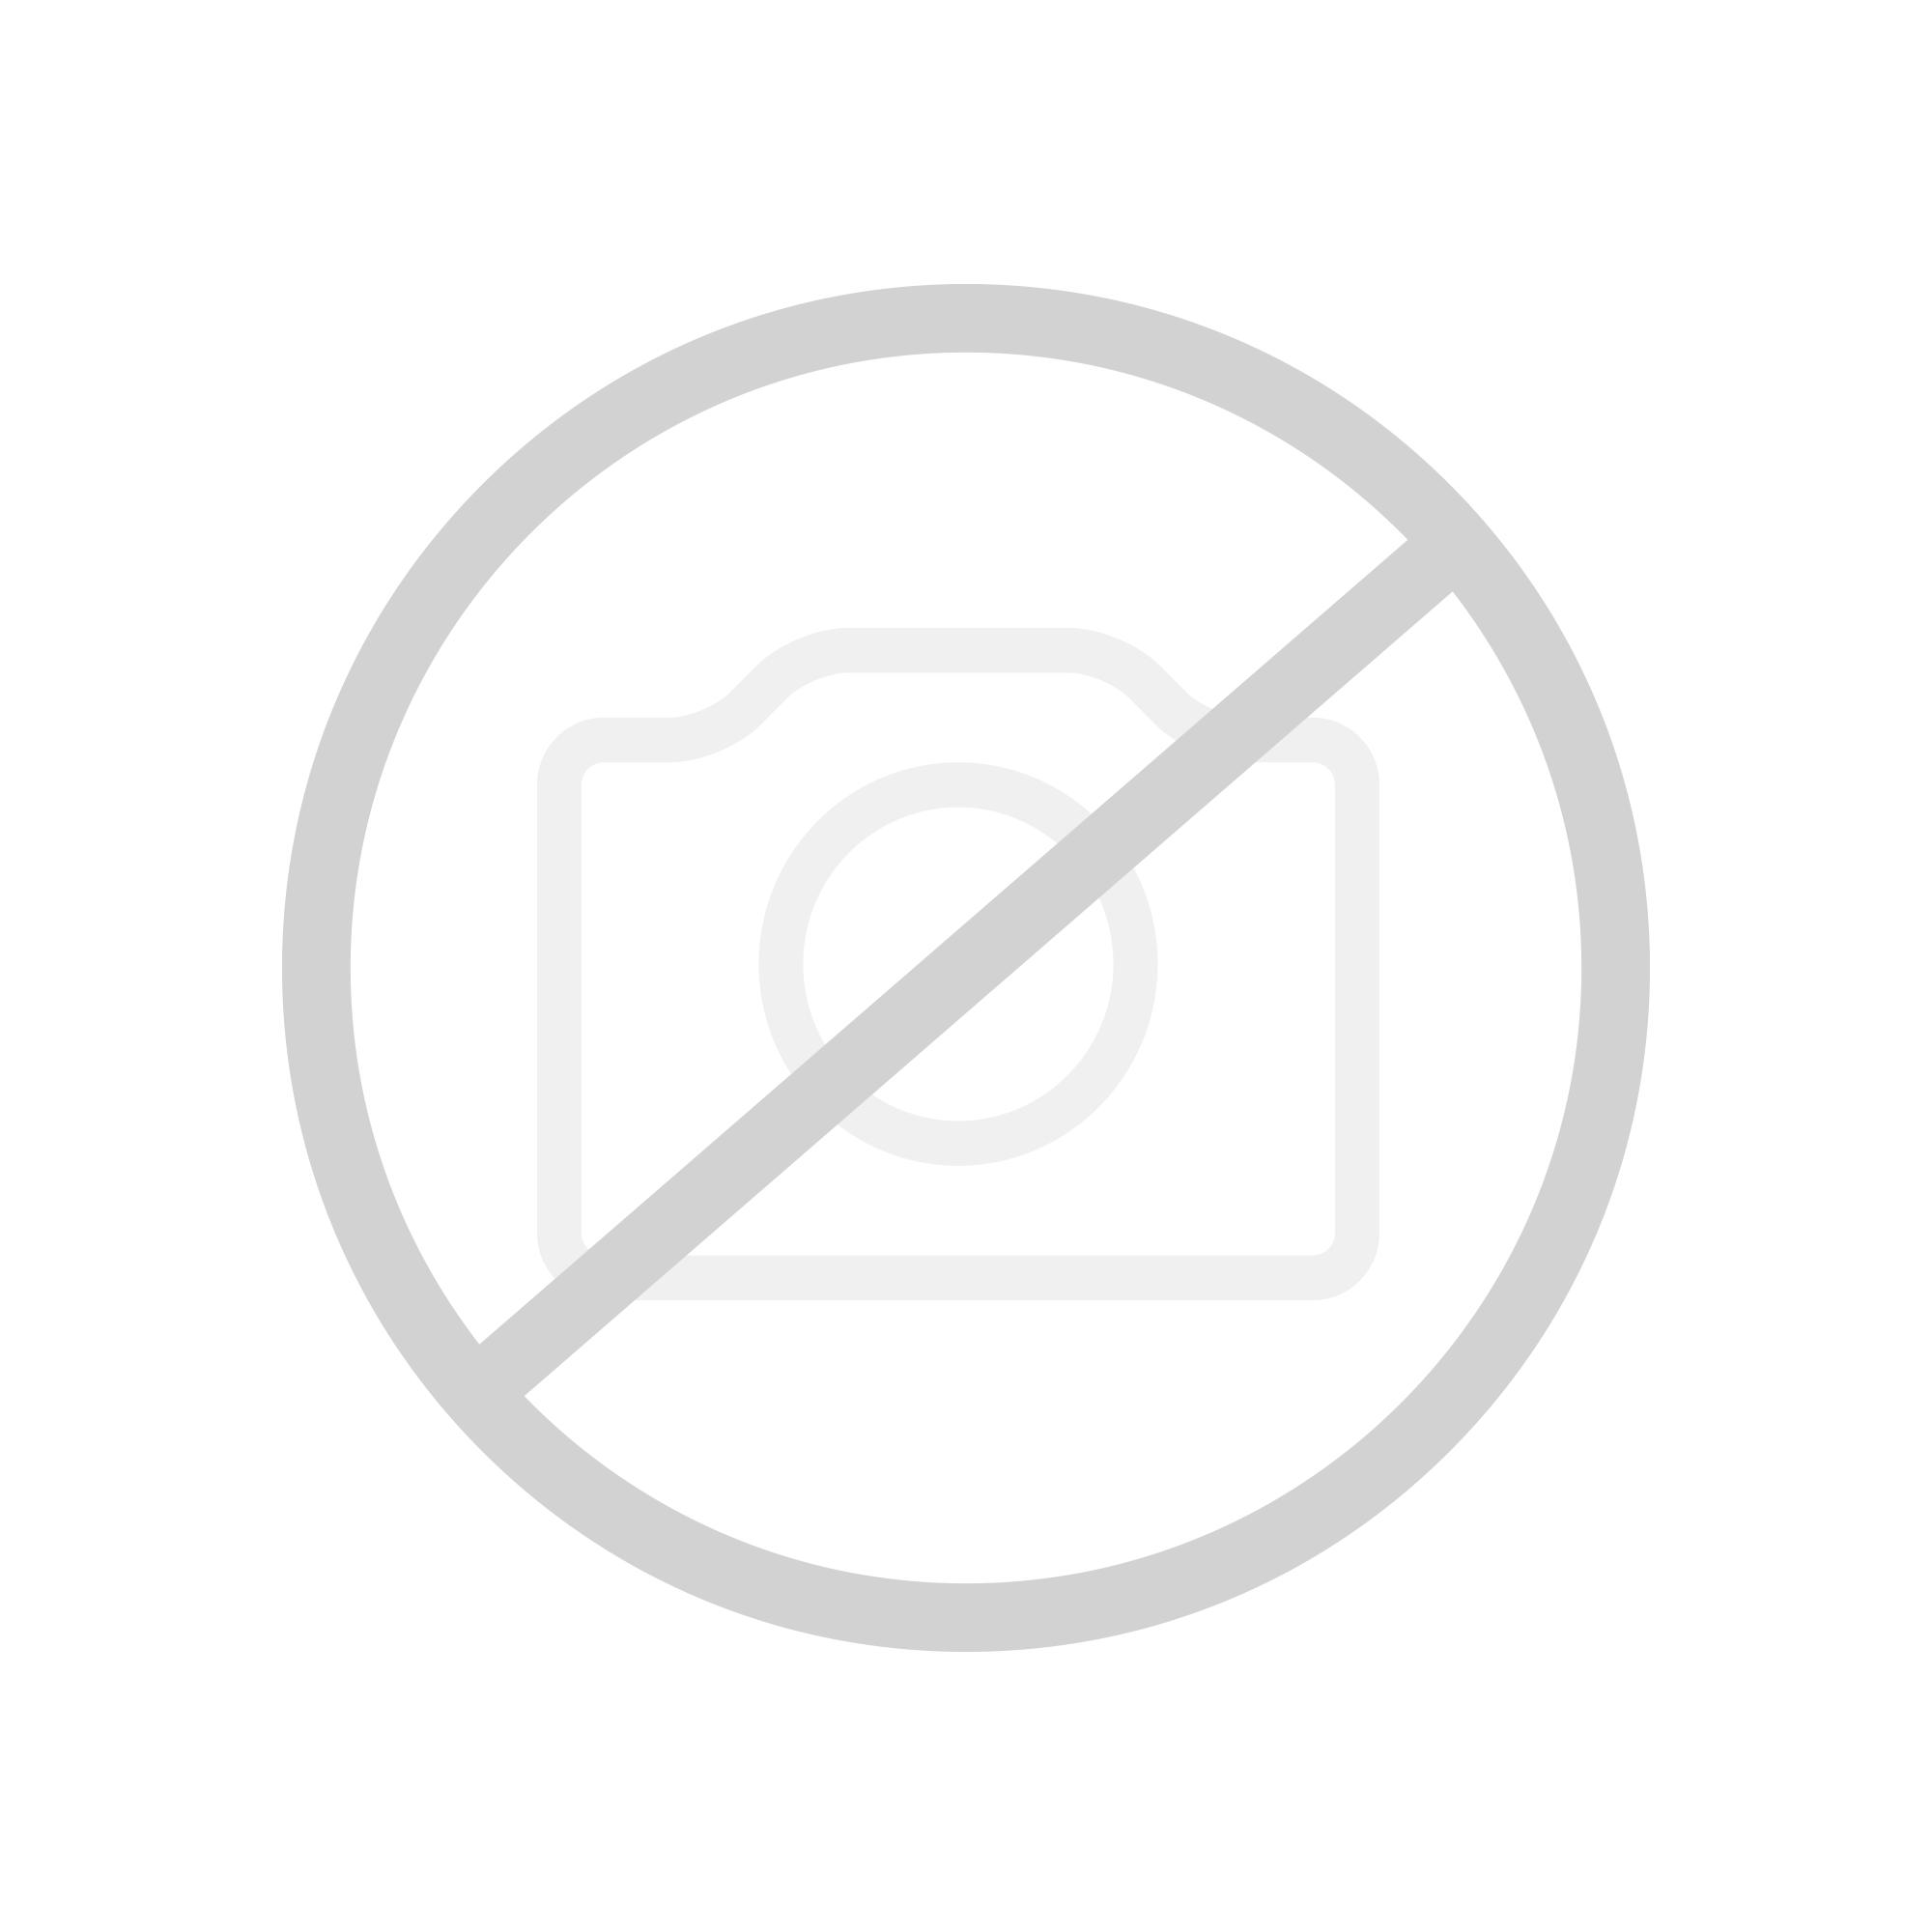 Grohe Minta Touch Küchenarmatur chrom